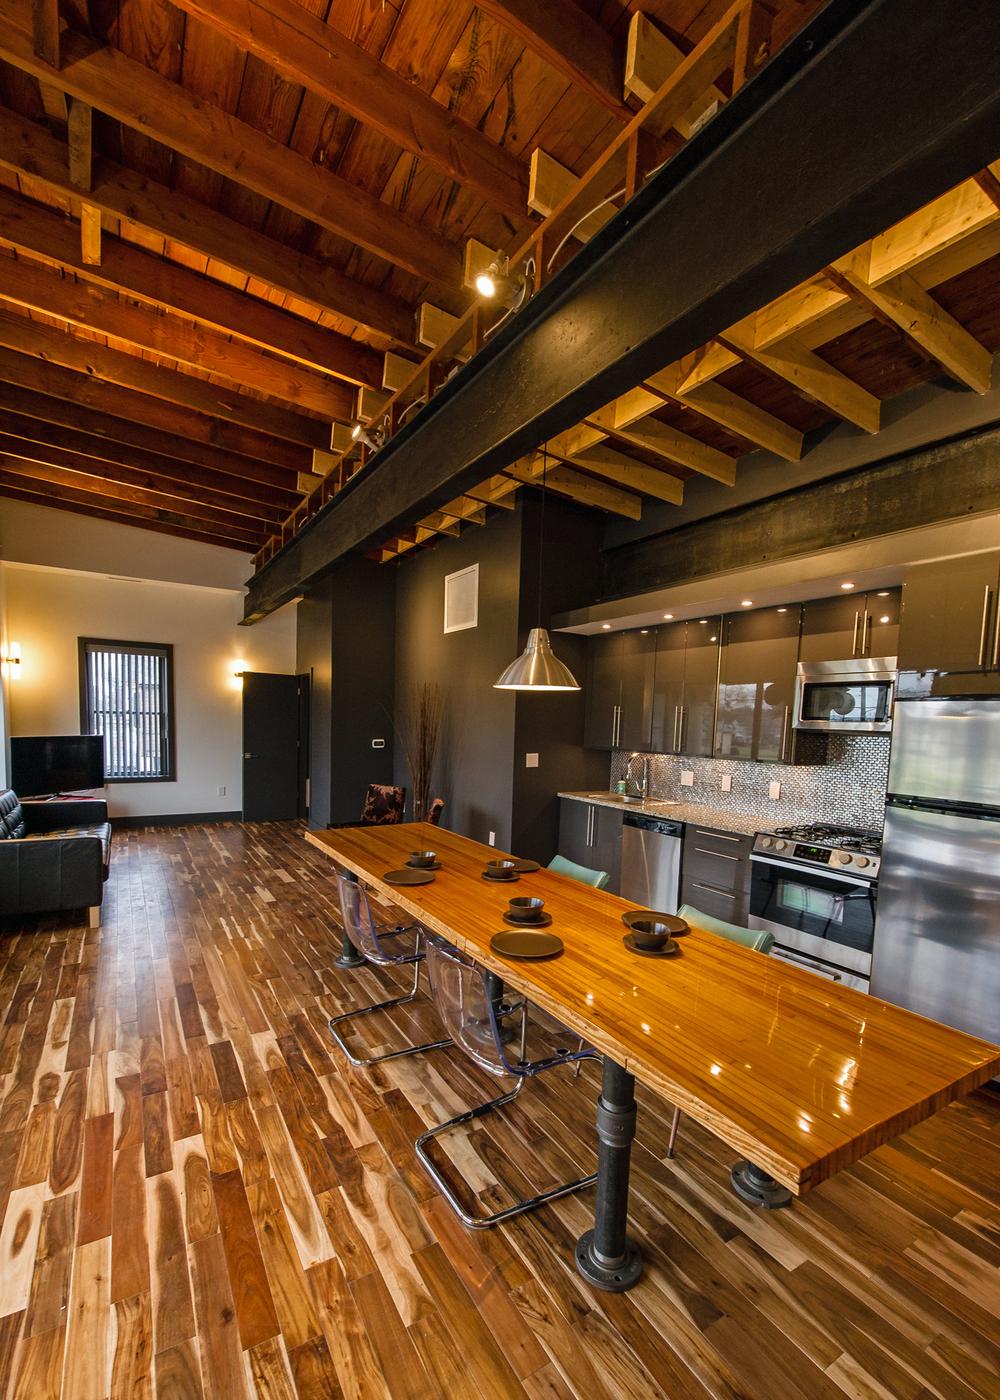 ApartmentInteriors-AP1.jpg